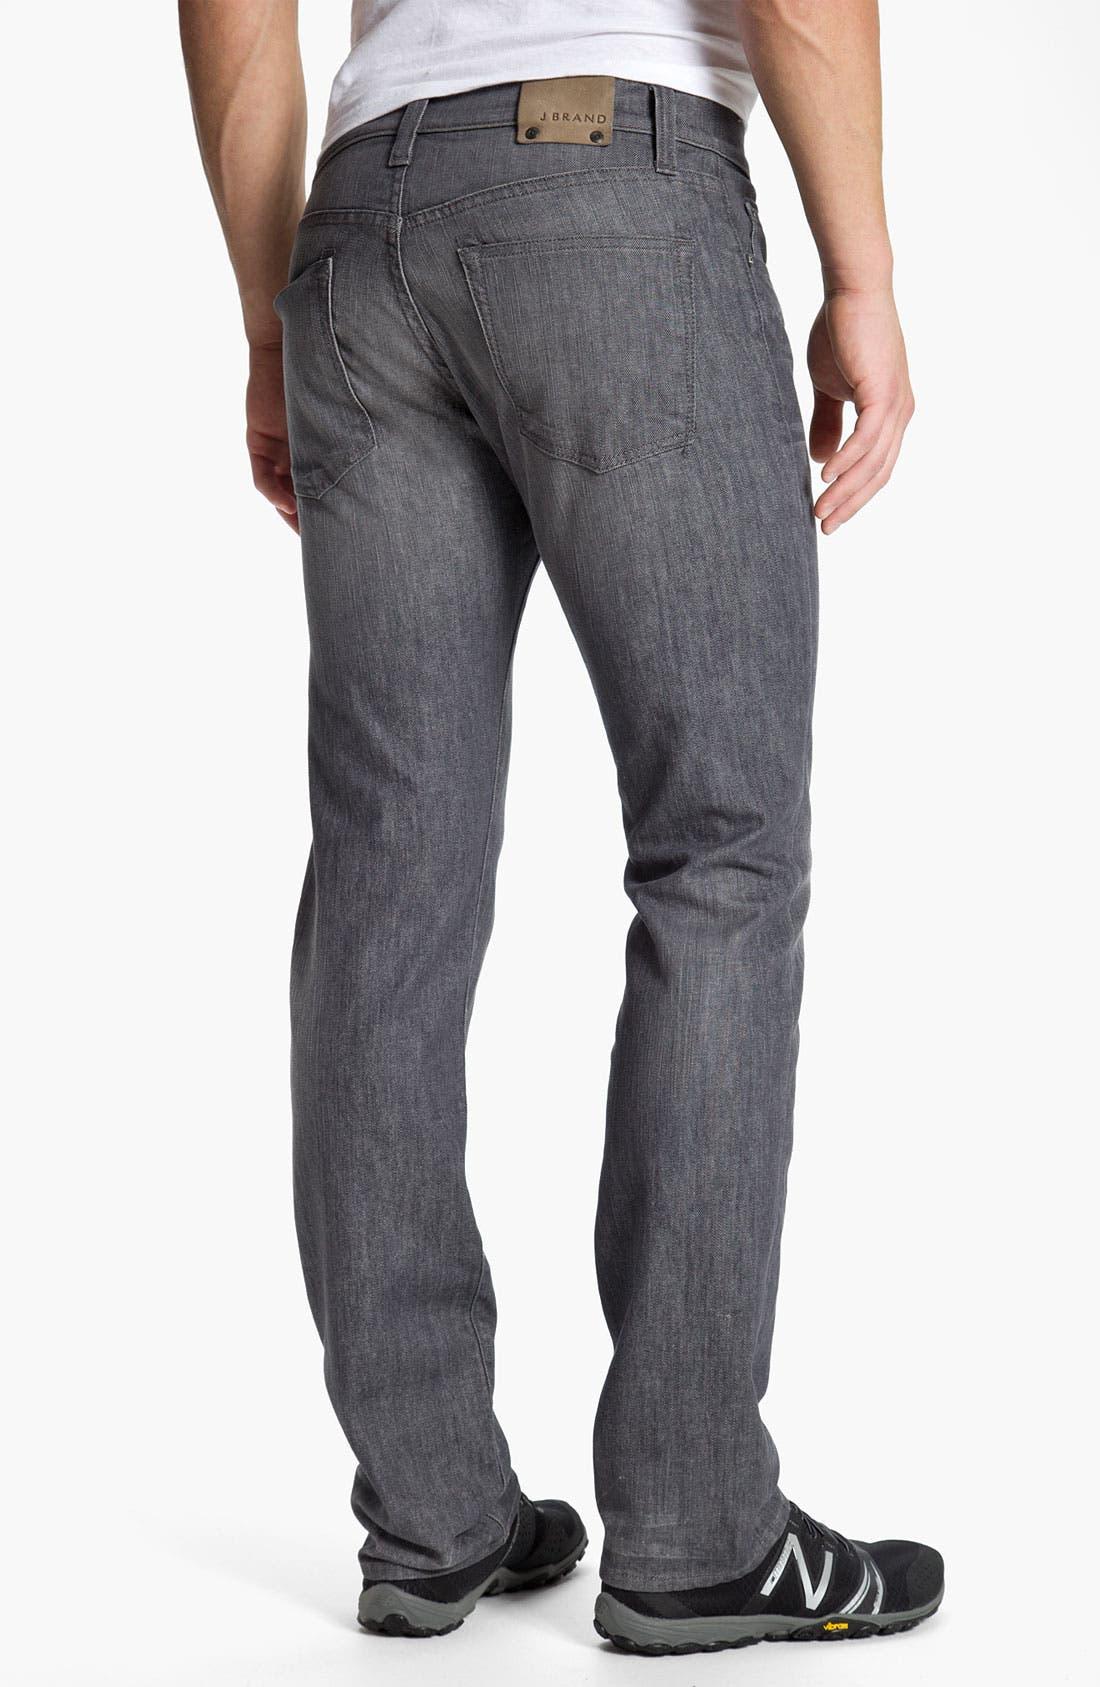 Alternate Image 1 Selected - J Brand 'Kane' Slim Fit Jeans (Ricochet) (Save Now through 12/9)